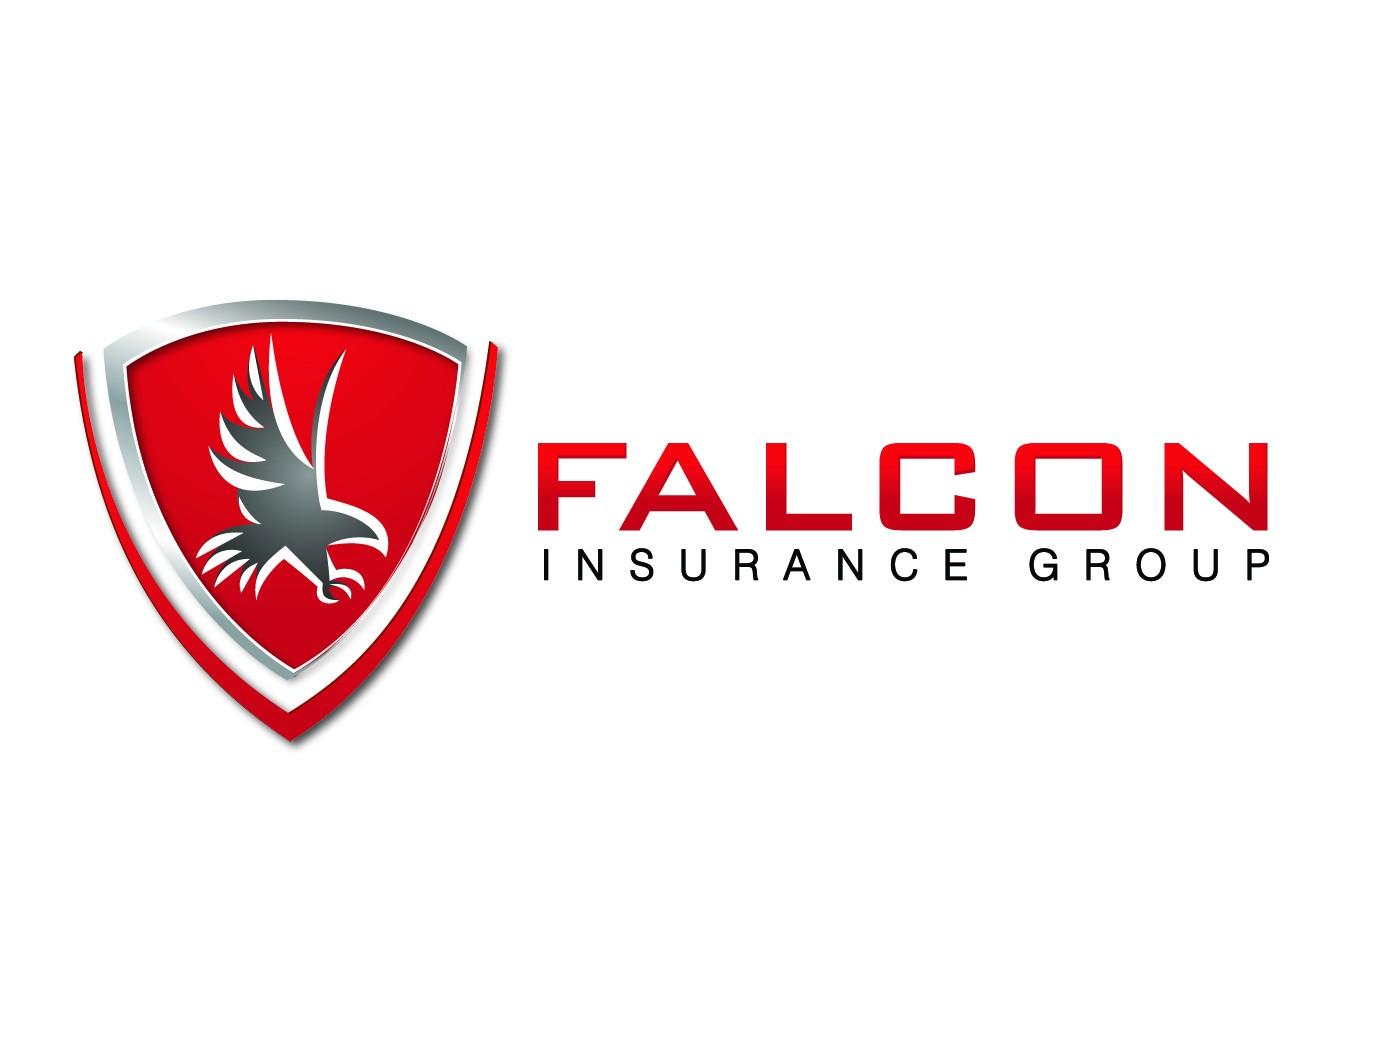 Falcon Insurance Group Llc Linkedin